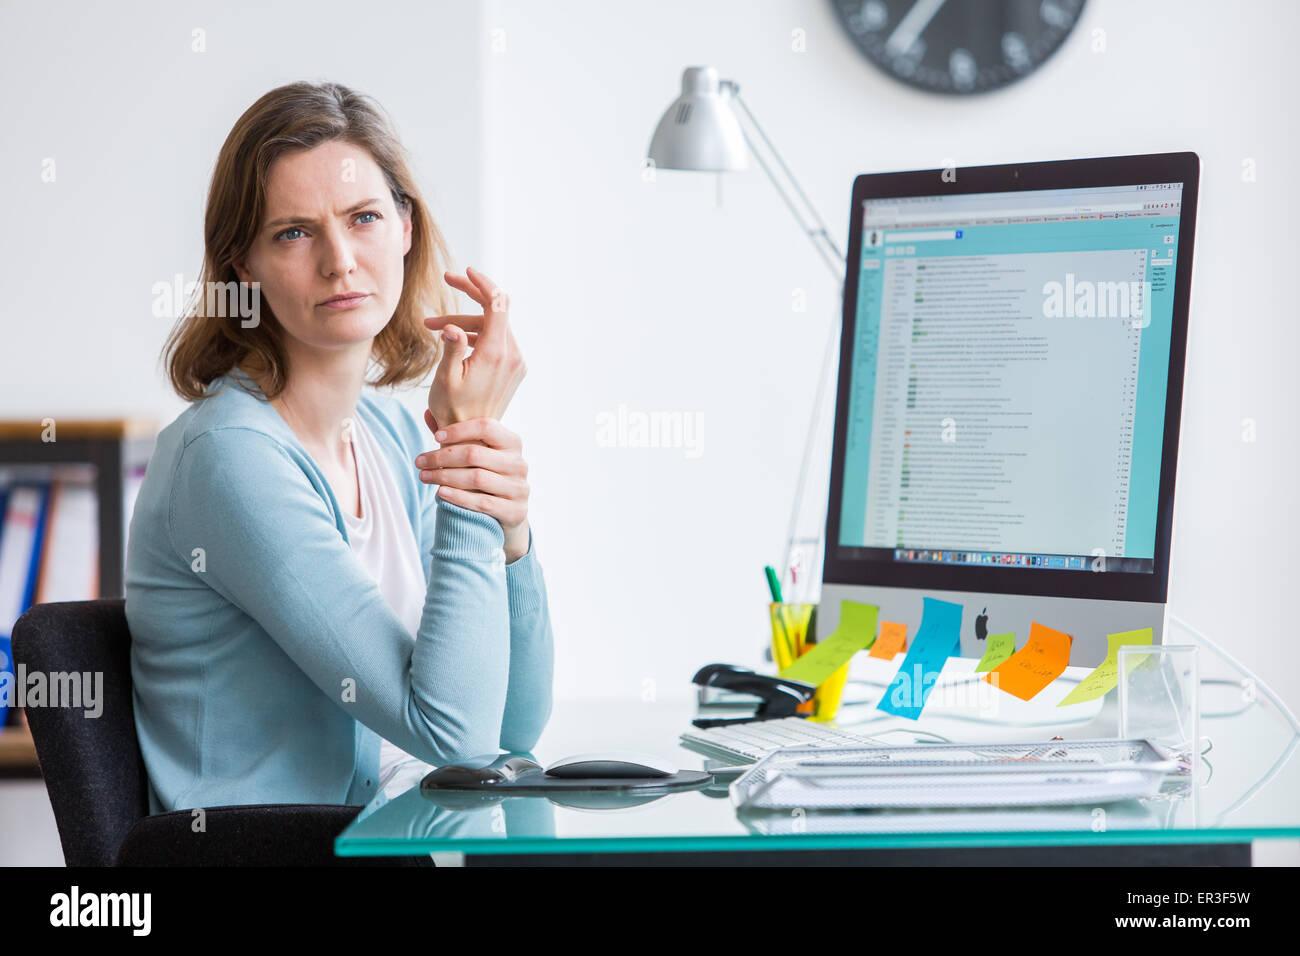 Frau bei der Arbeit leiden, Schmerzen am Handgelenk. Stockbild